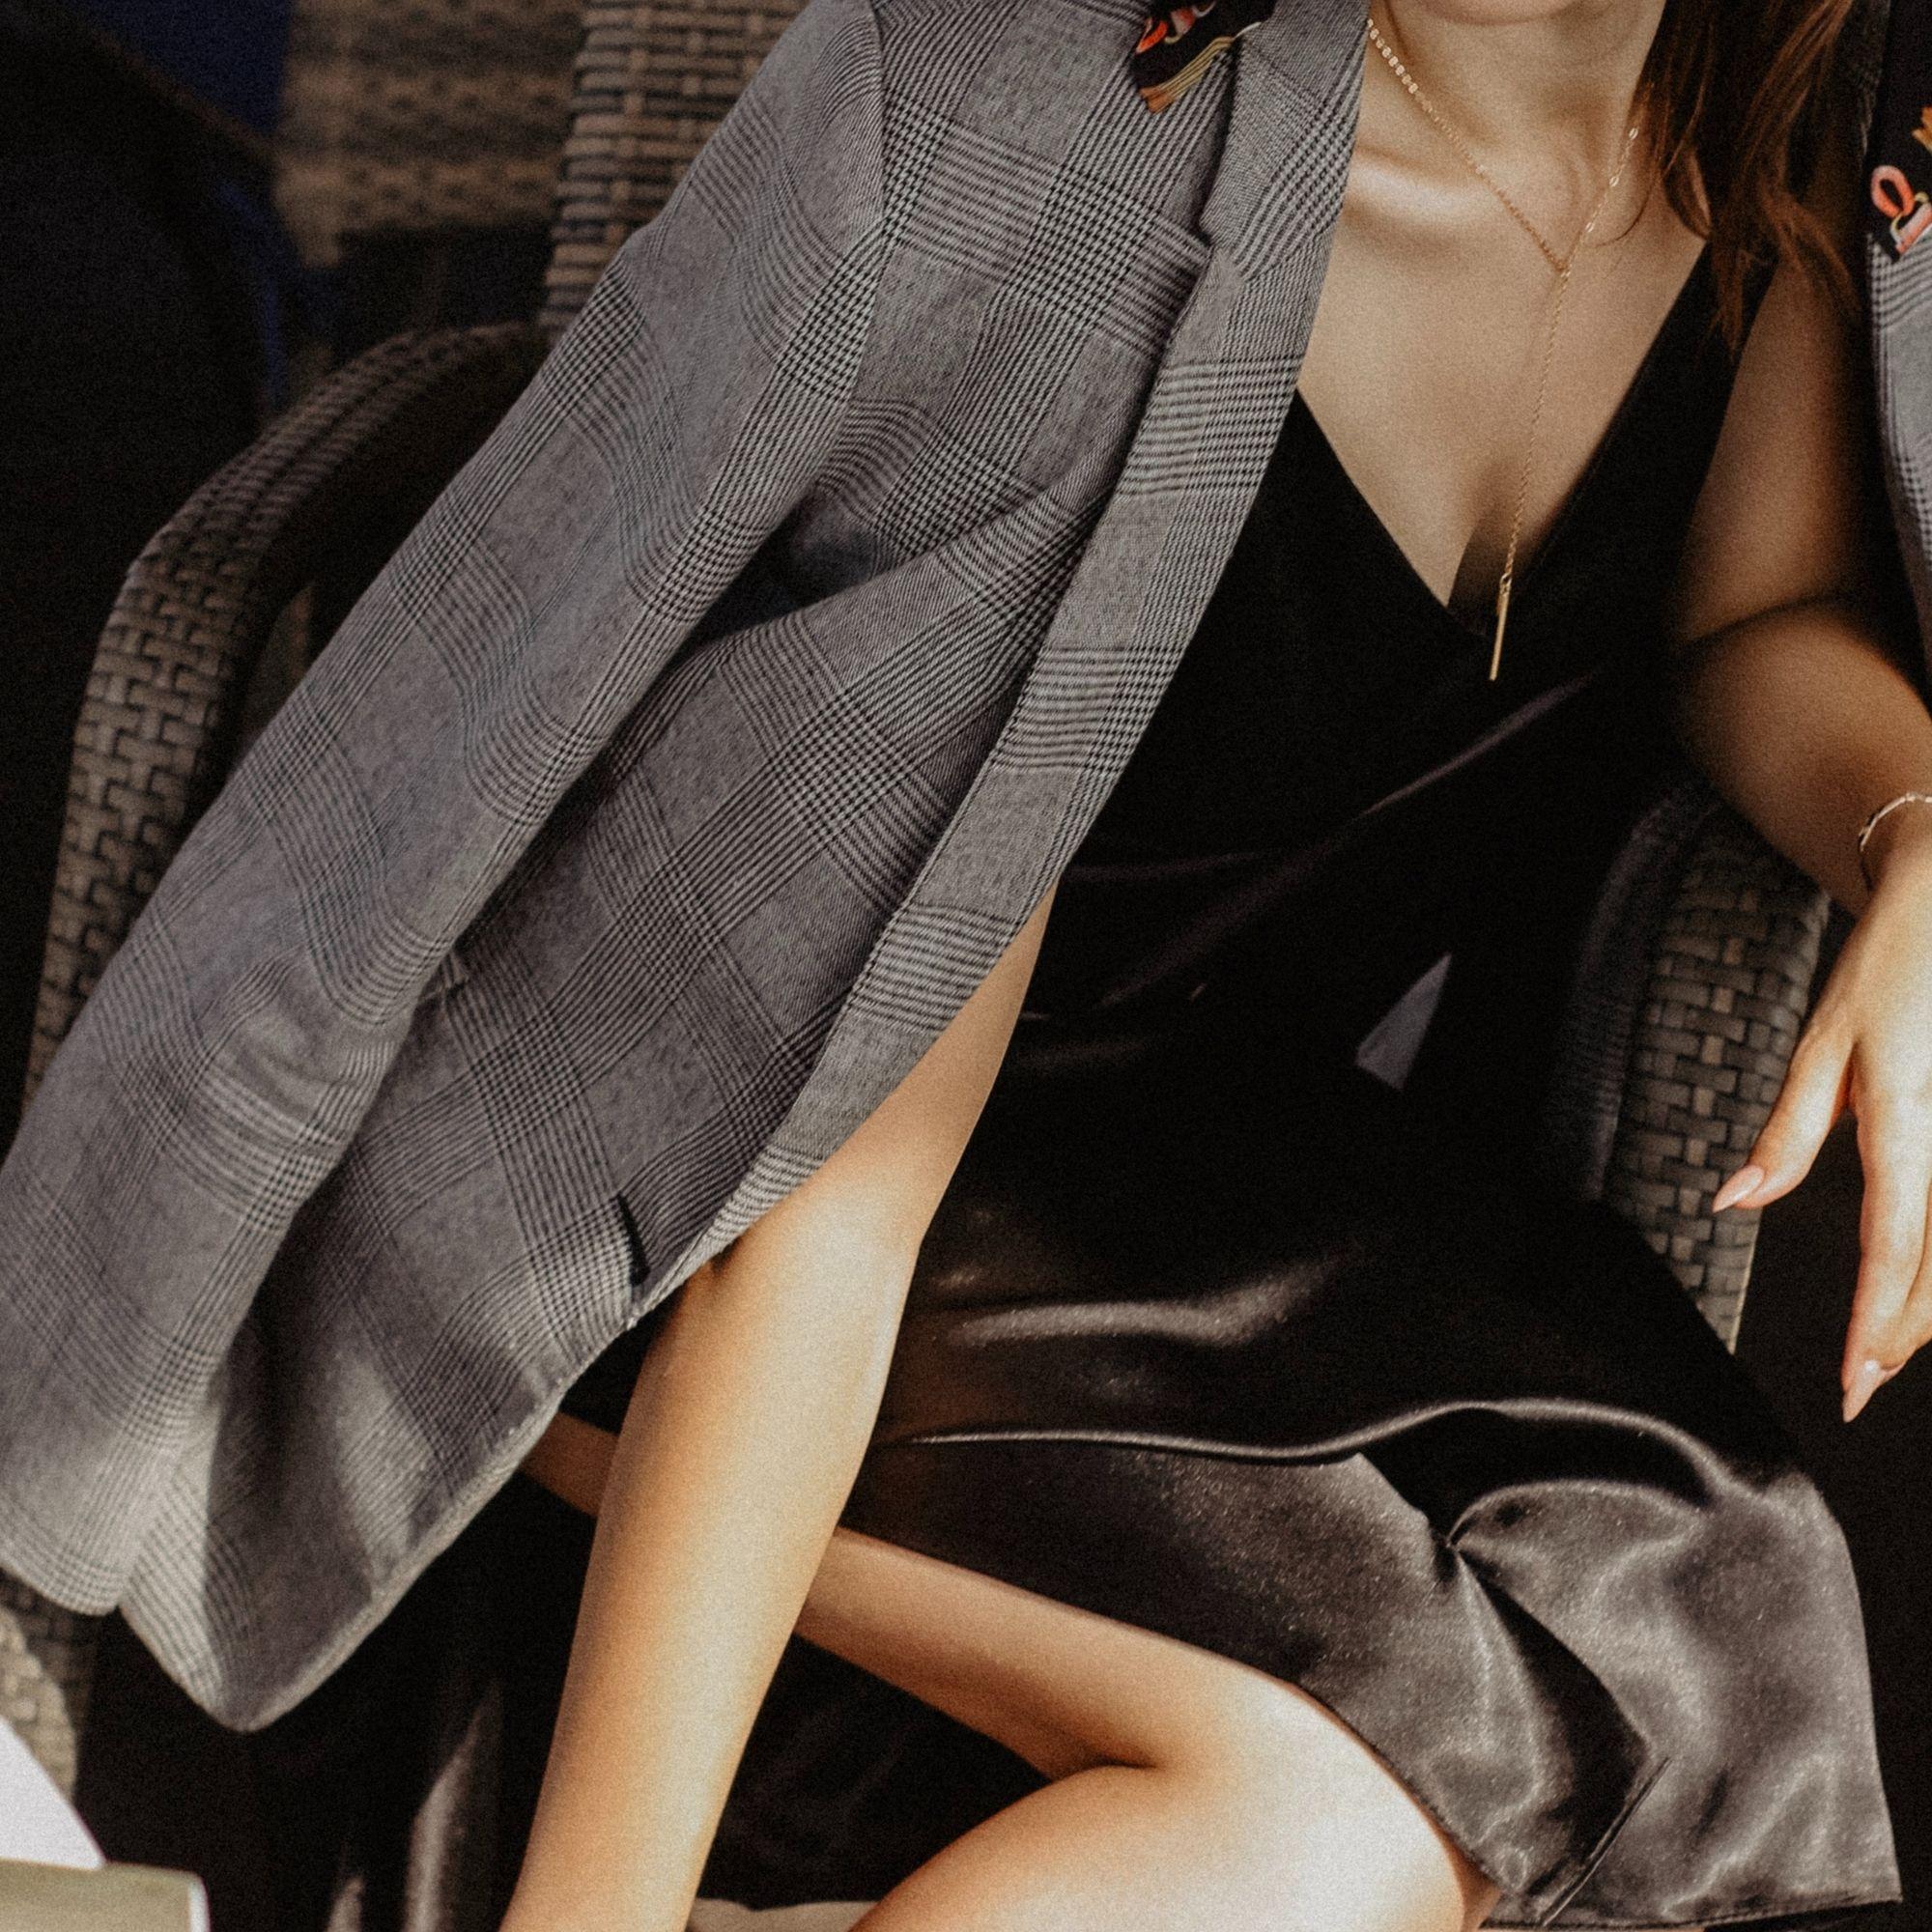 Woman in grey blazer and black slip dress